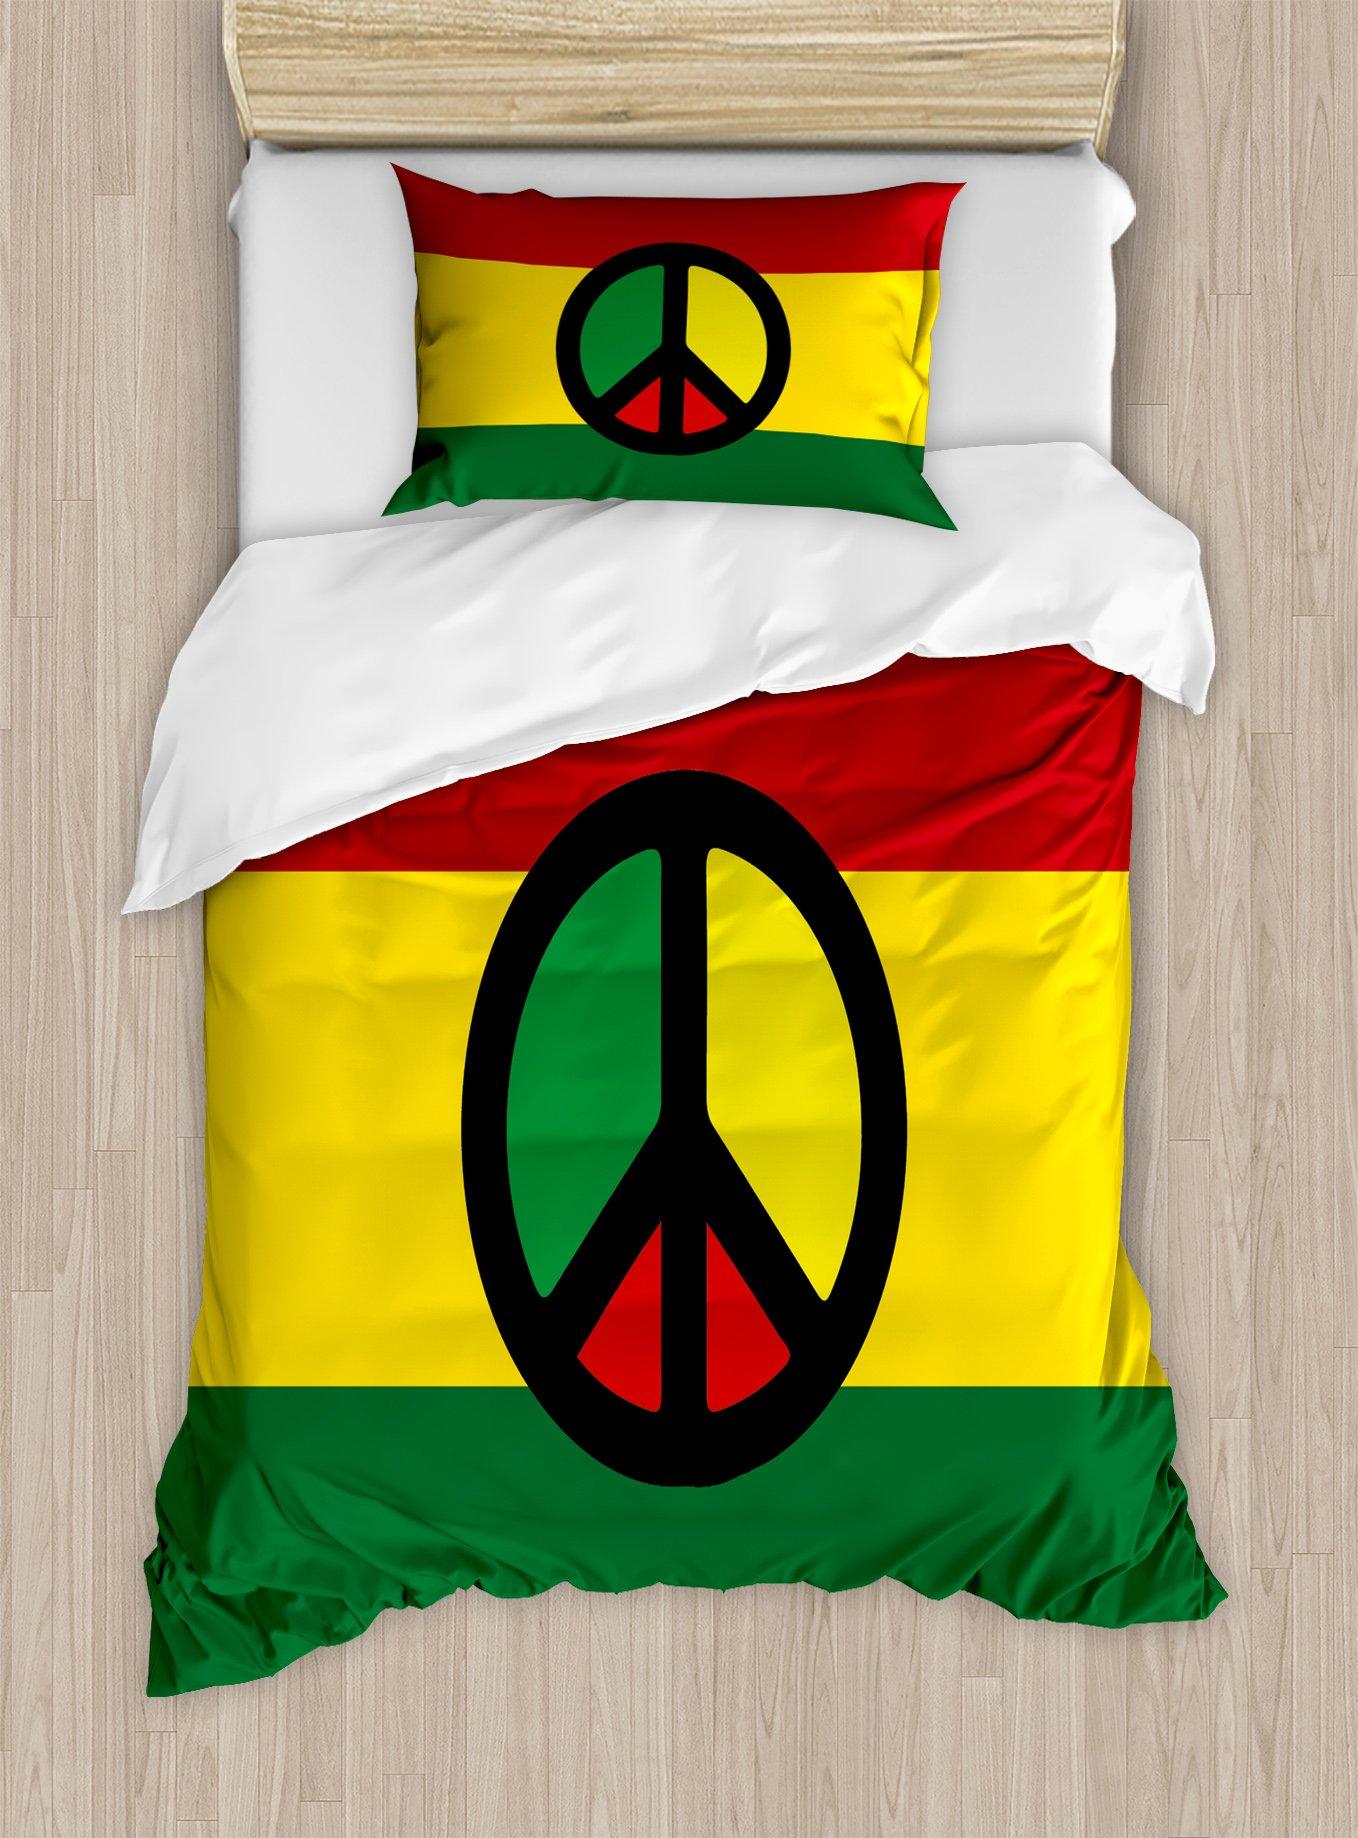 Ambesonne Jamaican Duvet Cover Set Twin Size, Reggae Culture Peace Symbol Caribbean Country Flag Design Americas Rasta Culture, Decorative 2 Piece Bedding Set with 1 Pillow Sham, Multicolor